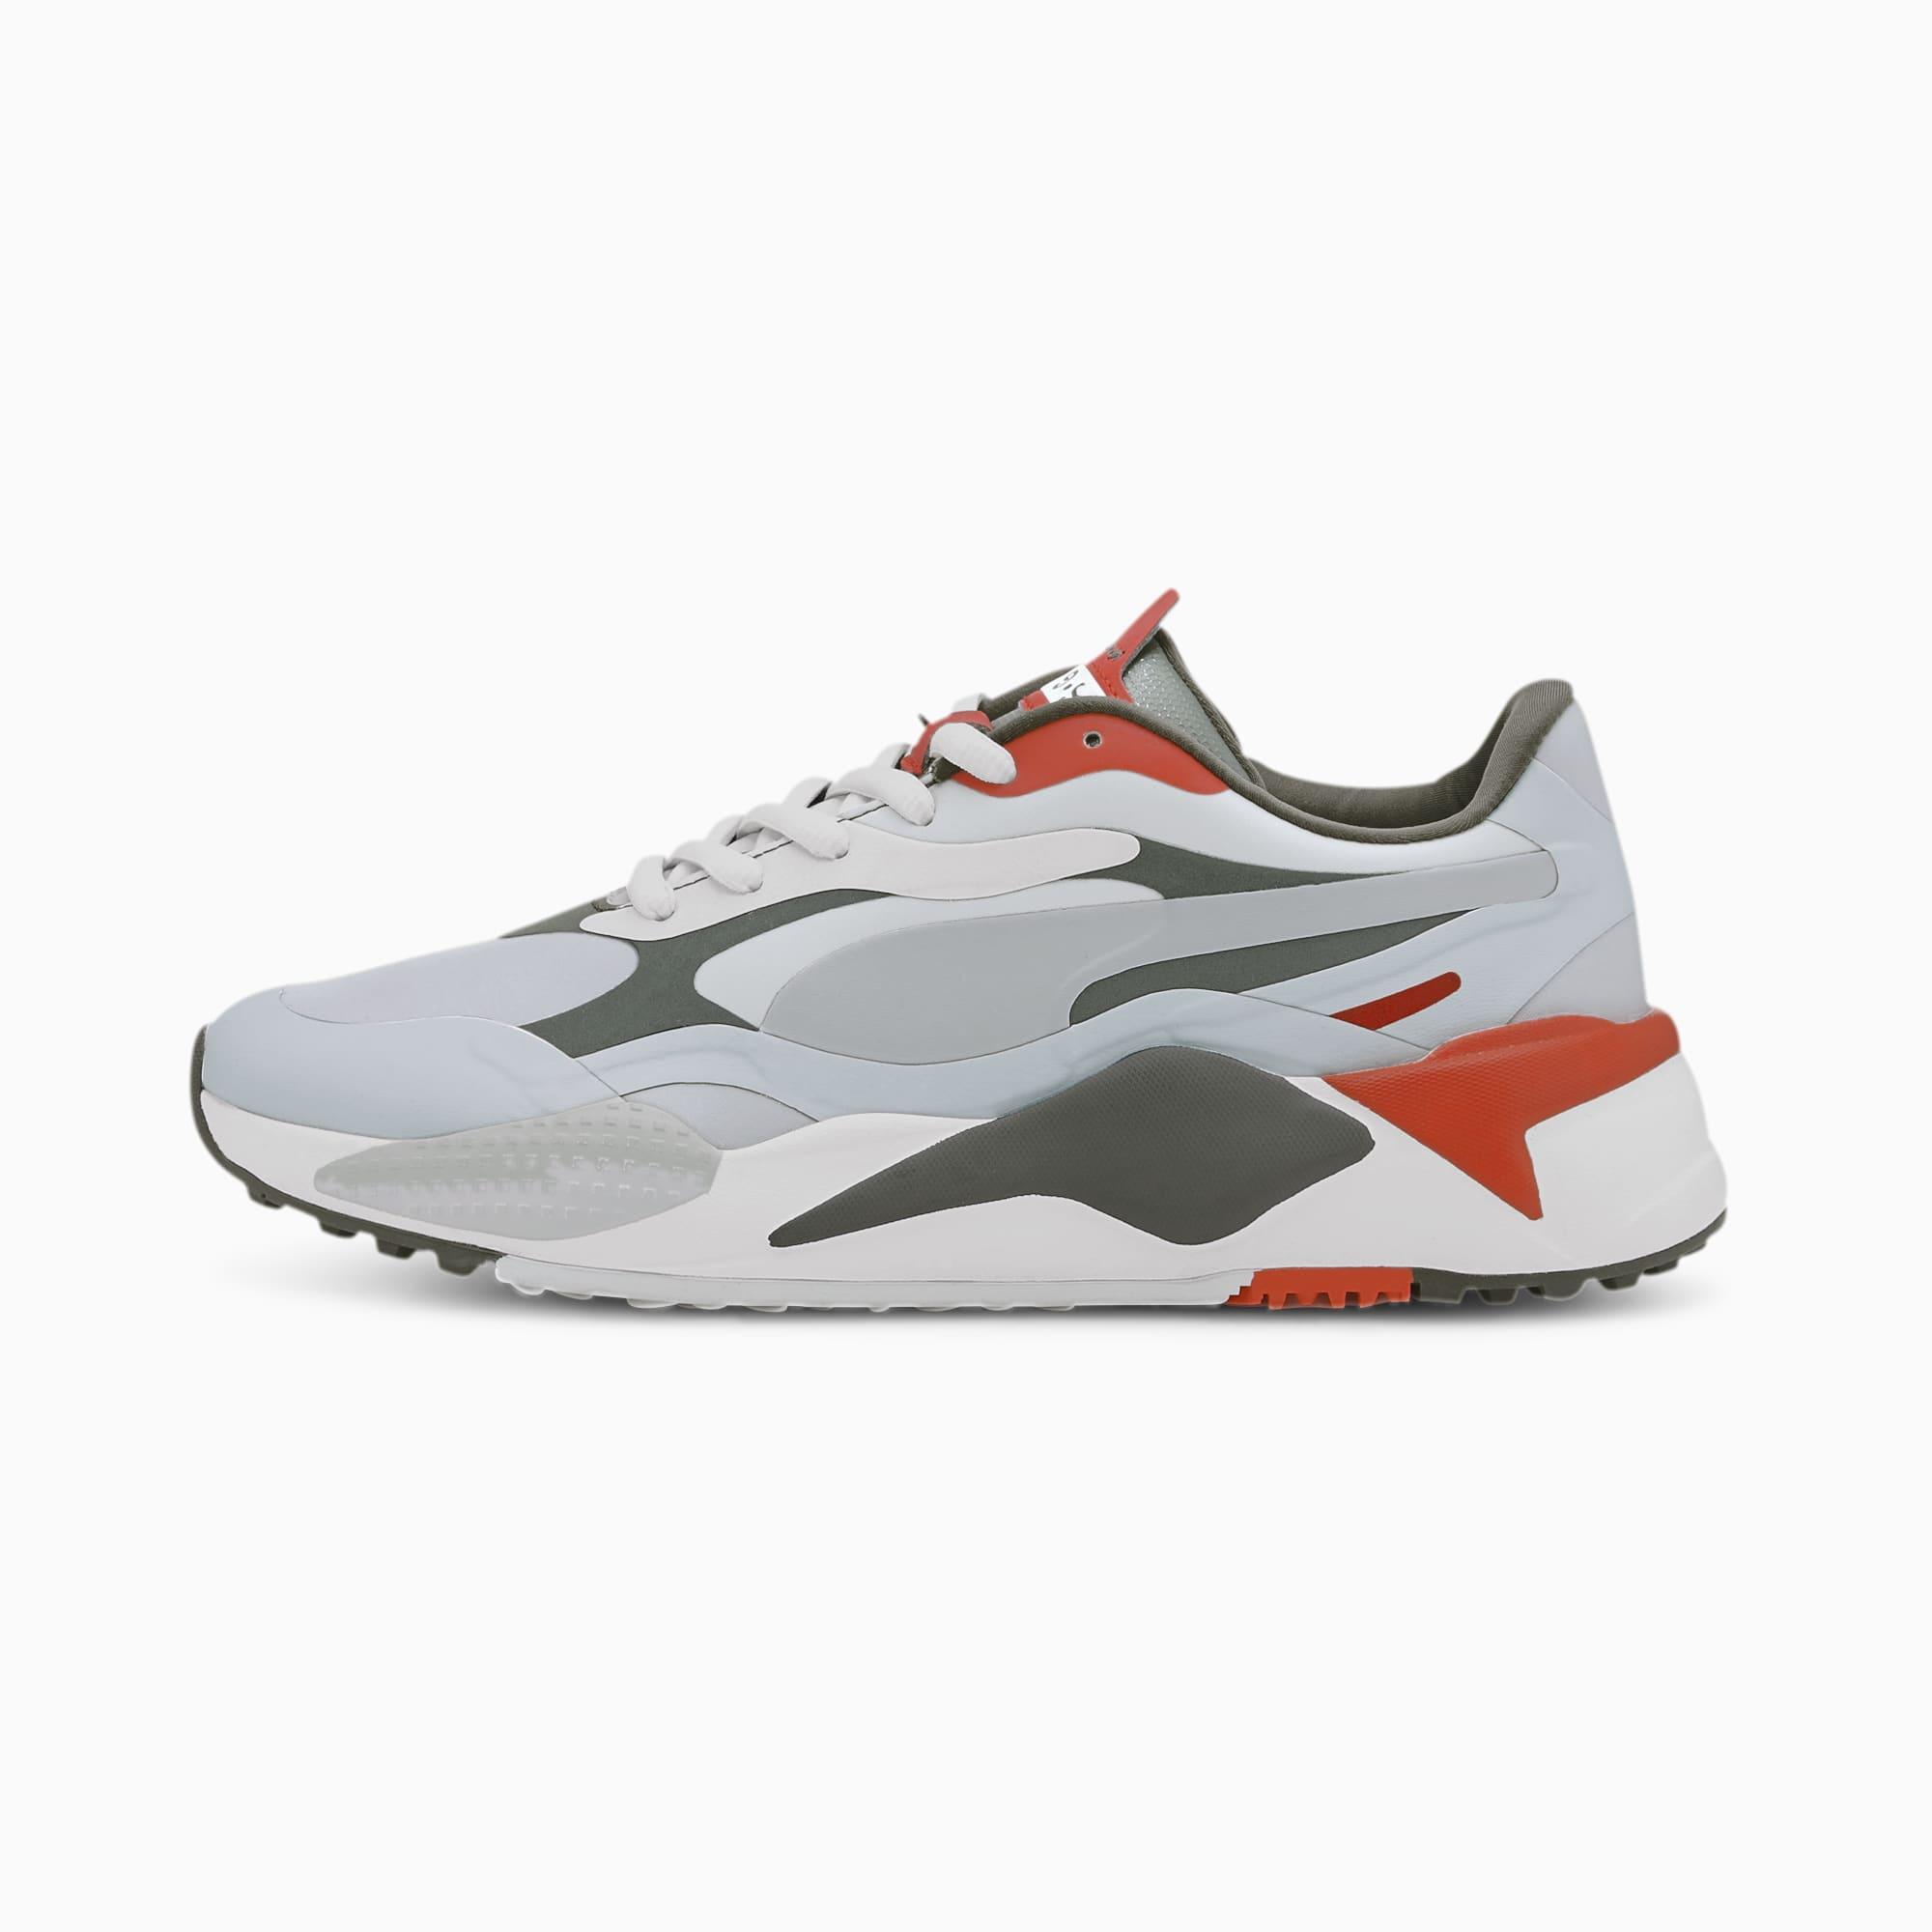 Rs G Golf Shoes Gray Thyme Pureed Pumpkin Puma Shoes Puma United Kingdom